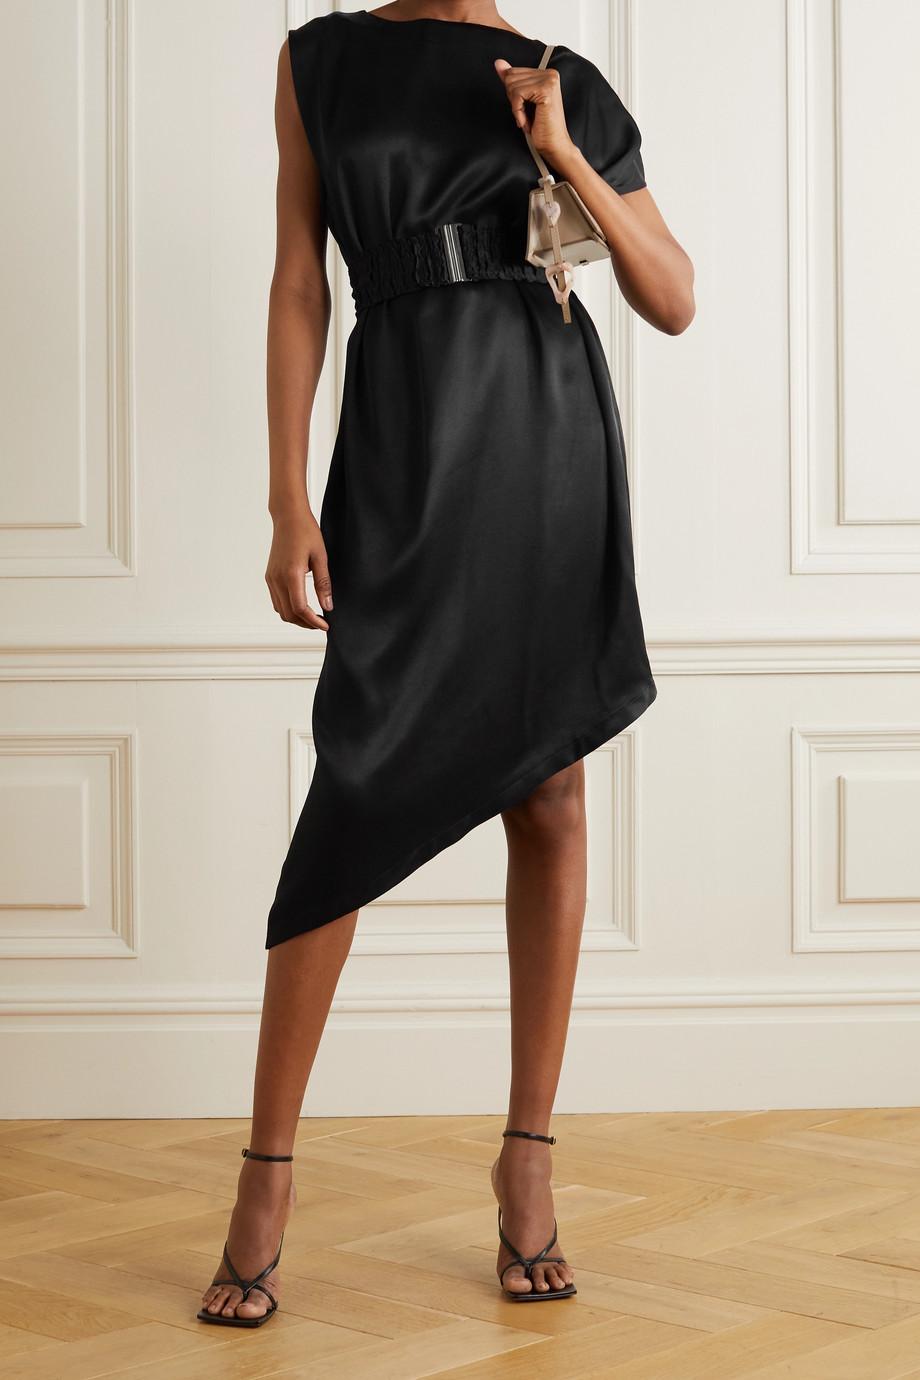 Envelope1976 + NET SUSTAIN Bordeaux asymmetric belted satin dress